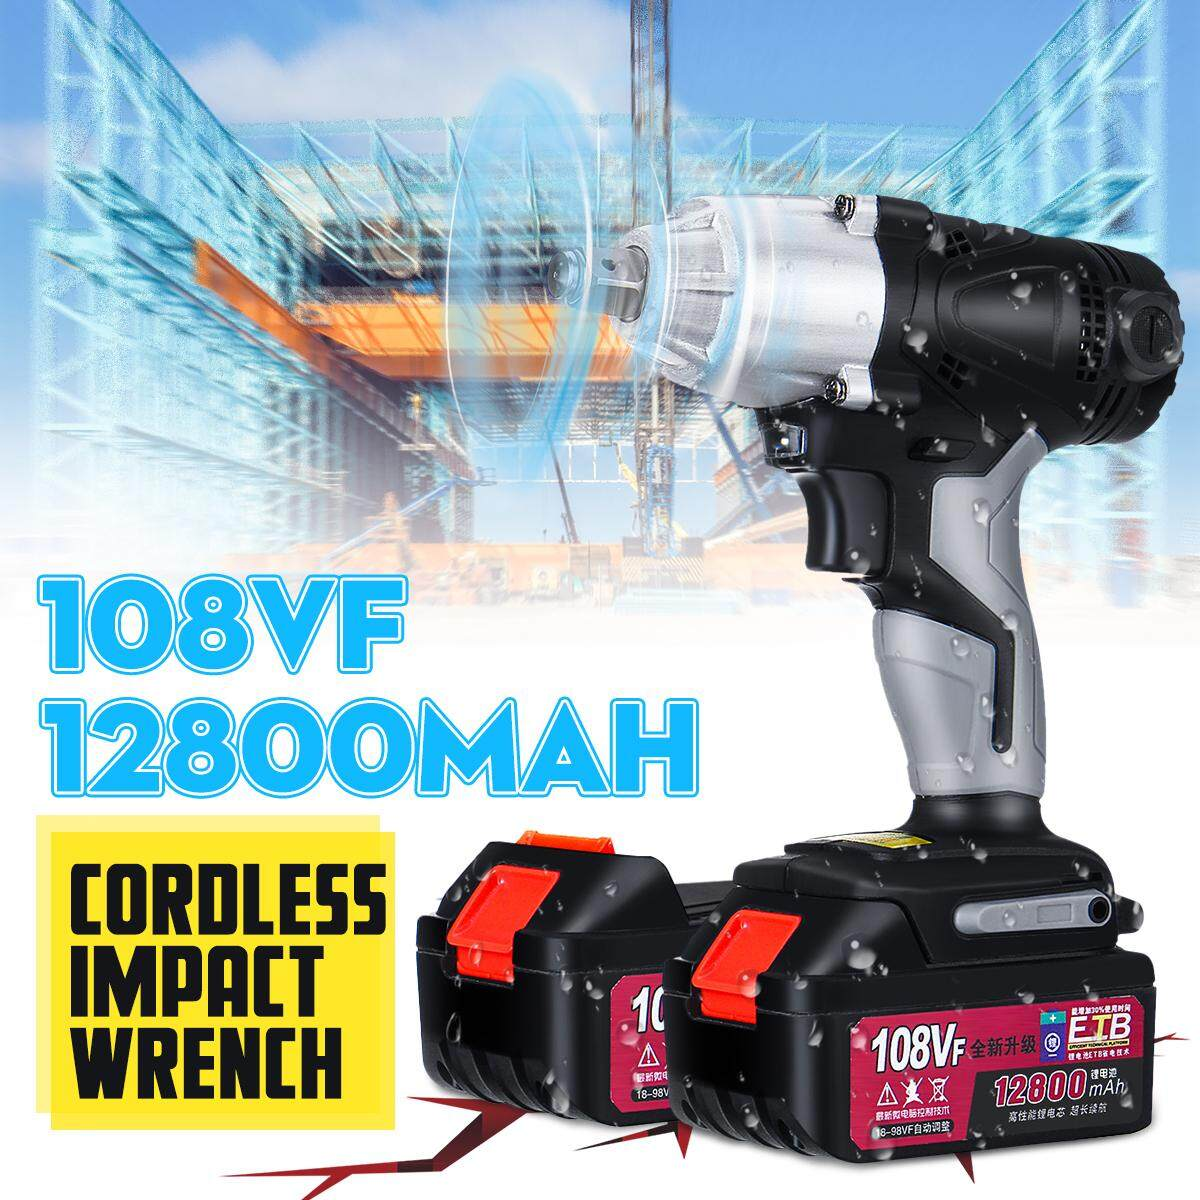 108VF LED Lighting Cordless Electric Impact Wrench 2pcs Li-Ion Batteries